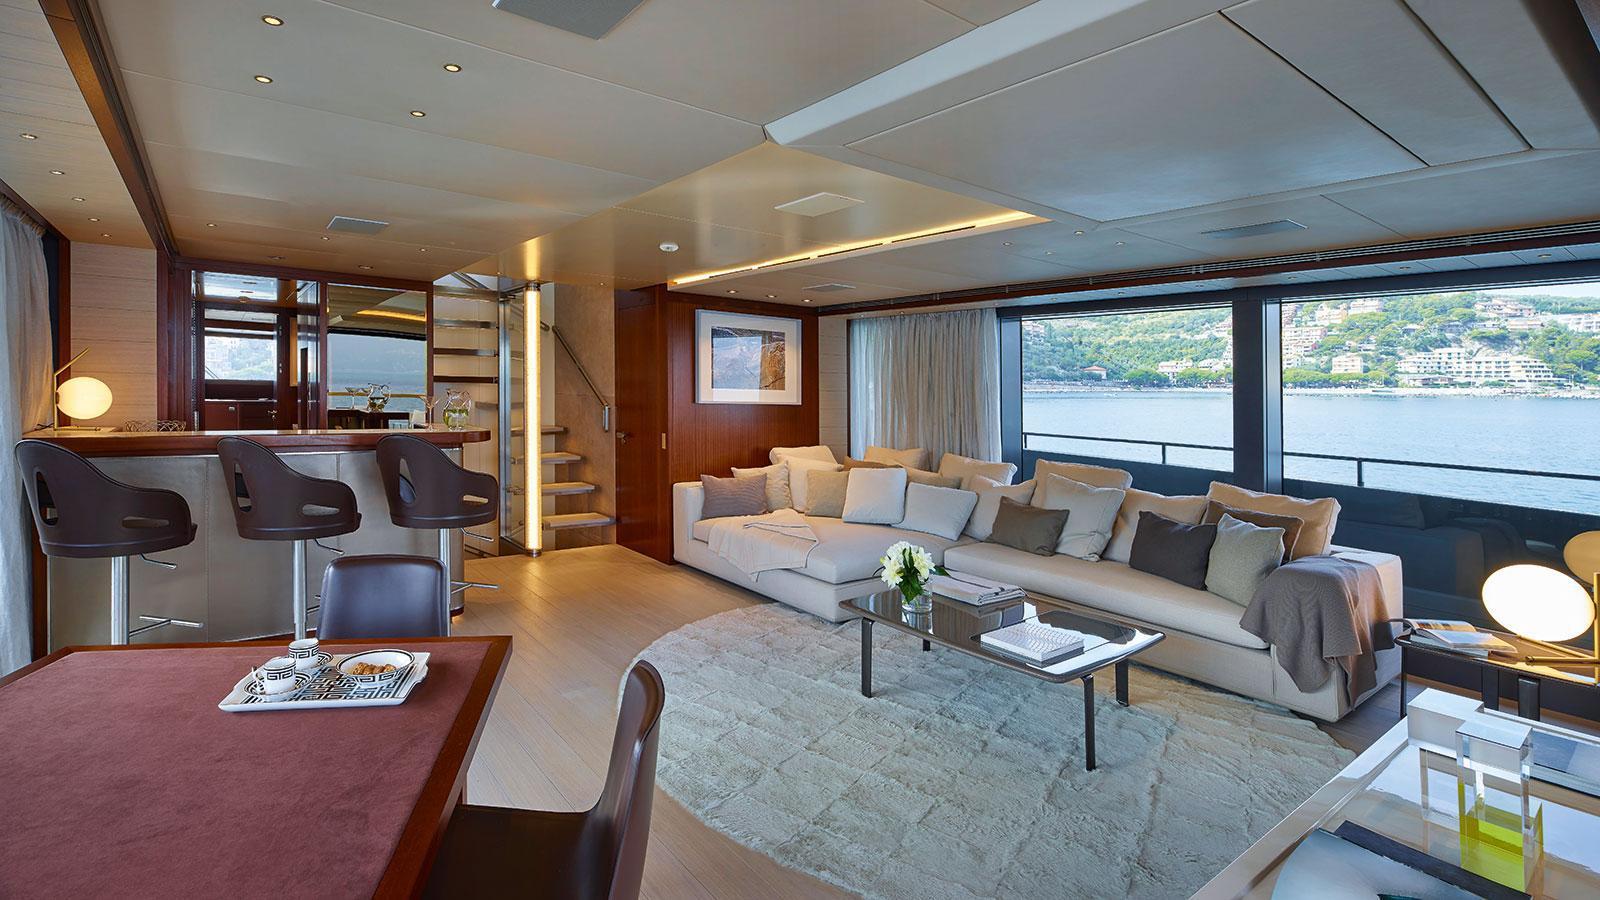 moka-expedition-motor-yacht-sanlorenzo-460-exp-2015-42m-upper-saloon